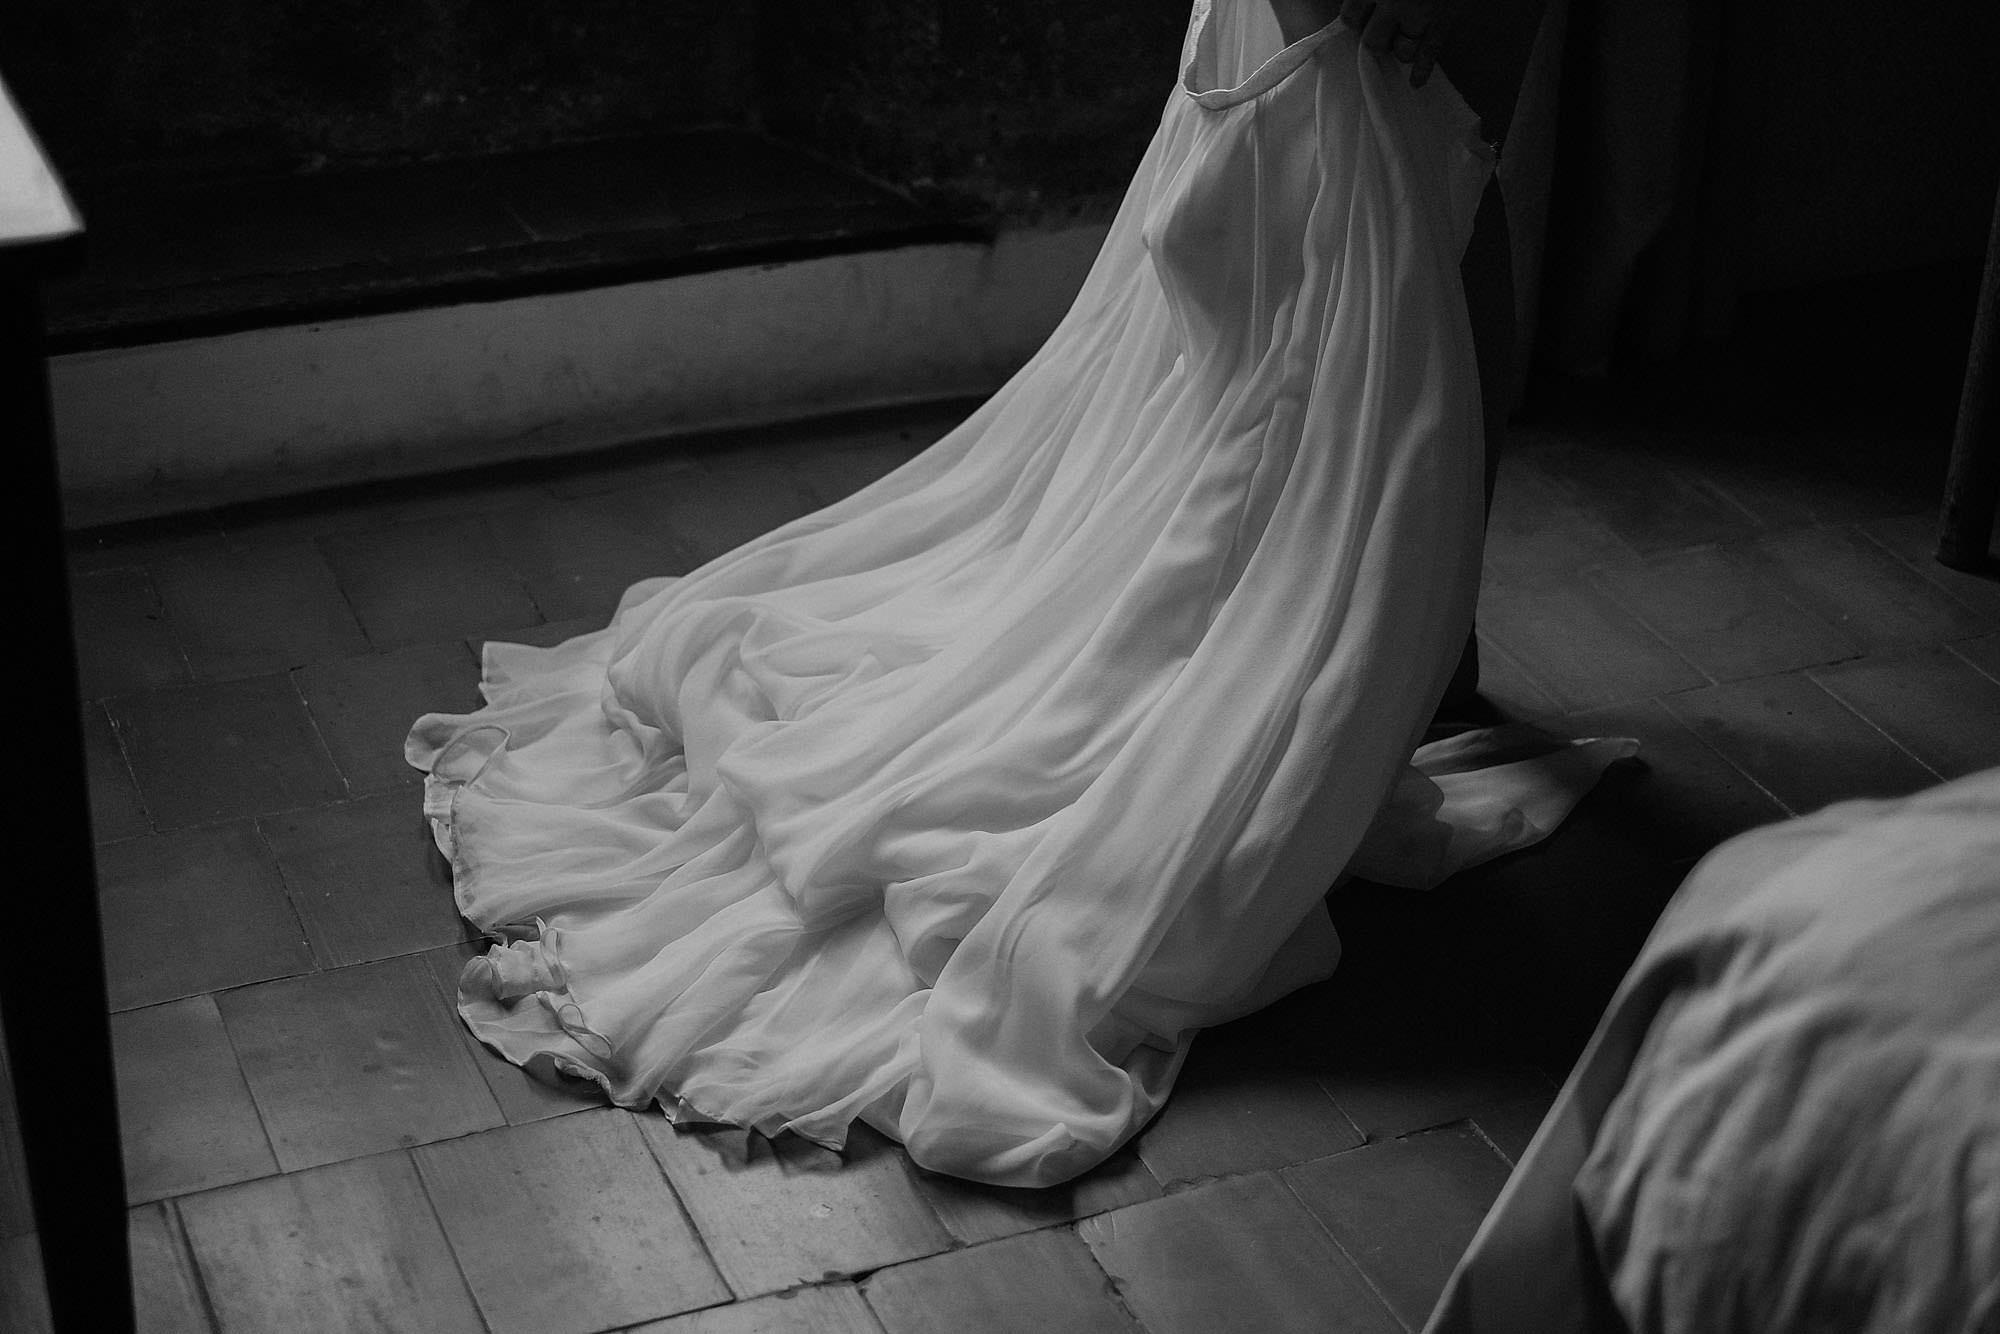 goult provence france elopement vow renewal dress photo